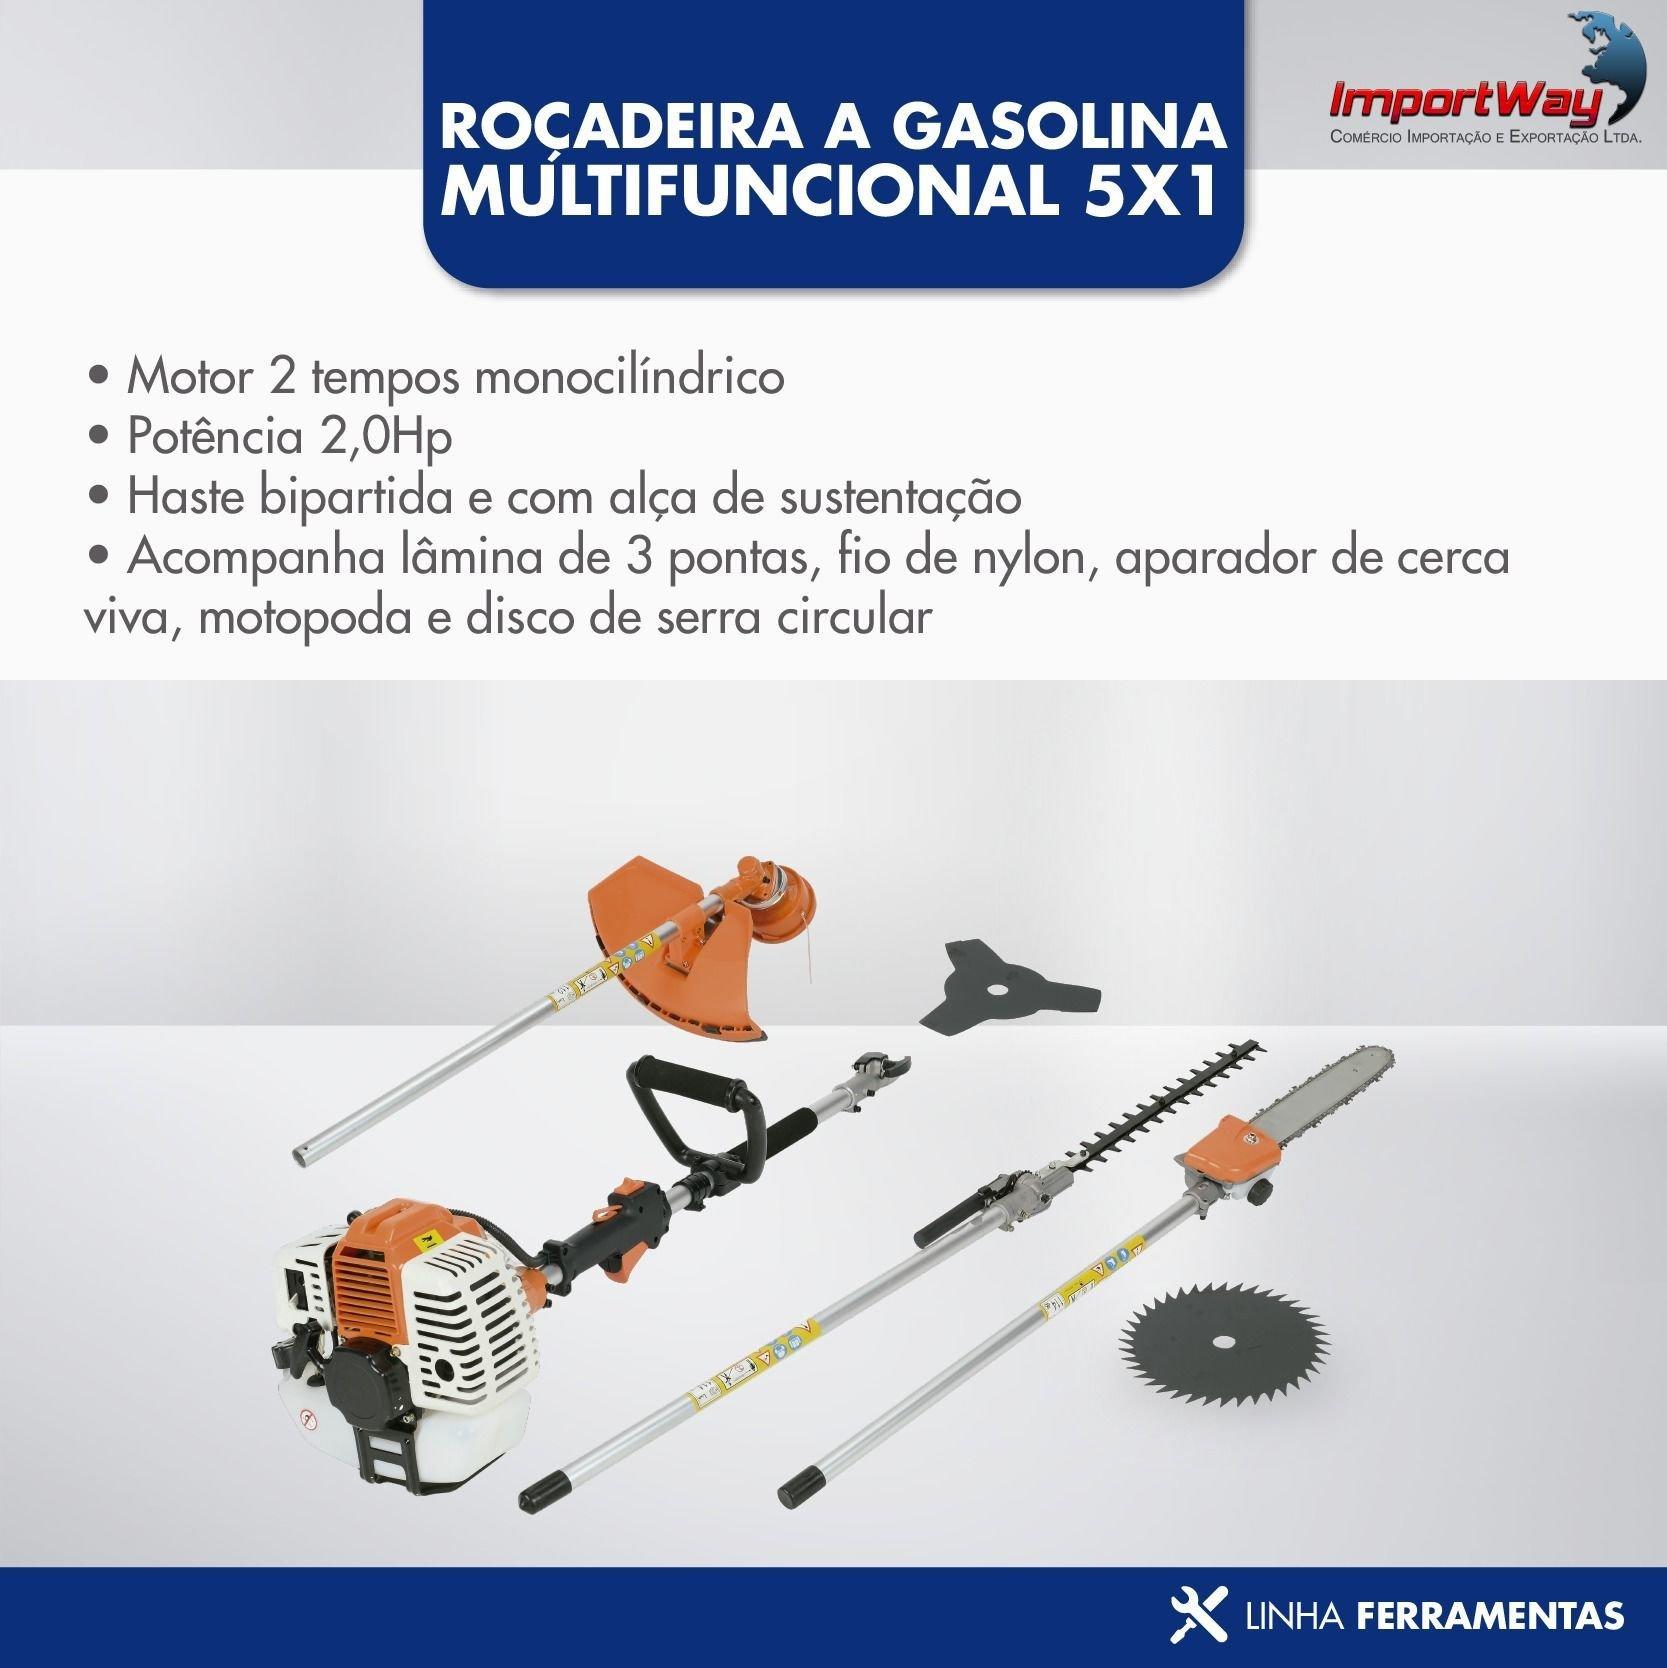 Roçadeira A Gasolina 58cc Multi Funções 5x1 - Importway